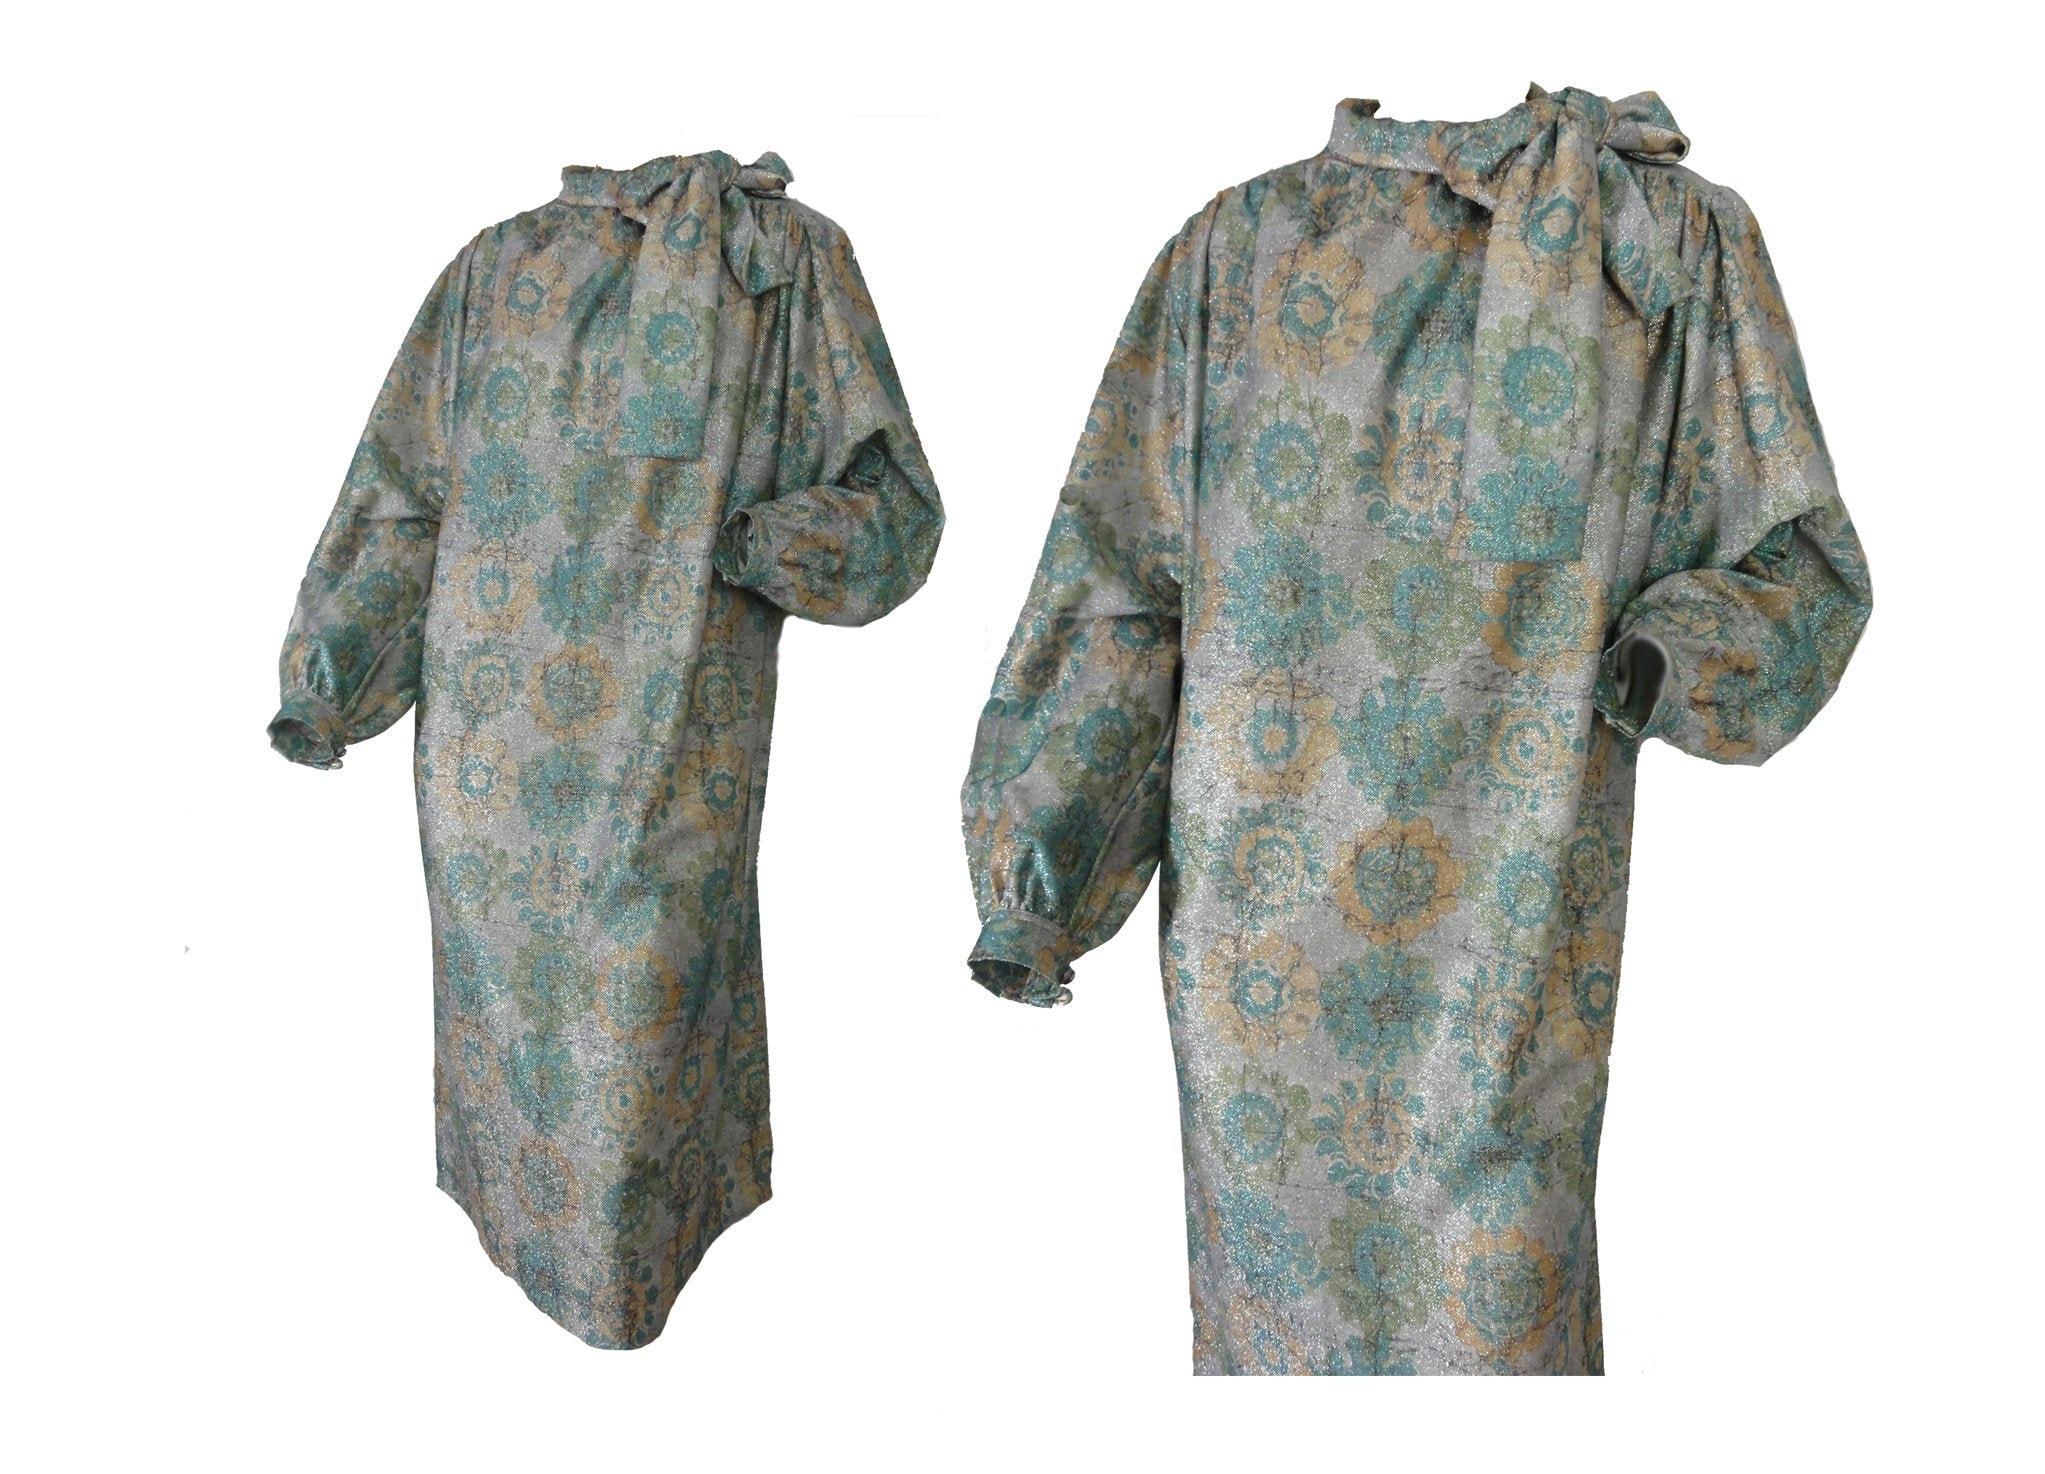 Vintage Scarf Styles -1920s to 1960s Vintage 70S Evening Dress Disco Party Sparkly Green Floral Print Lurex Knit Shift Scarf Neck Size Large $0.00 AT vintagedancer.com